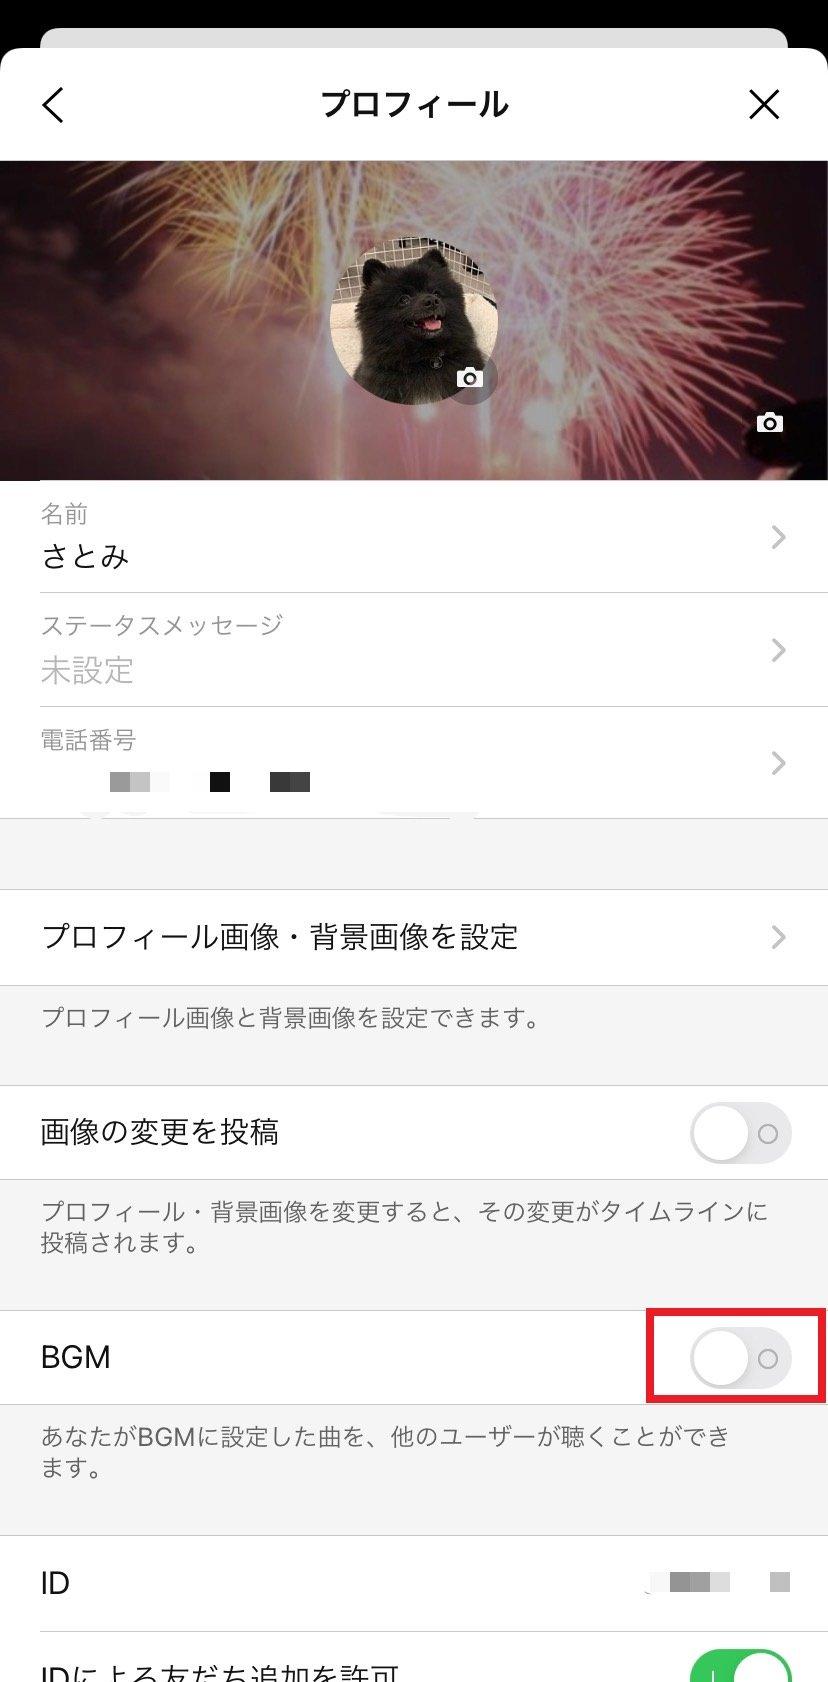 bgm-profile_03.jpg